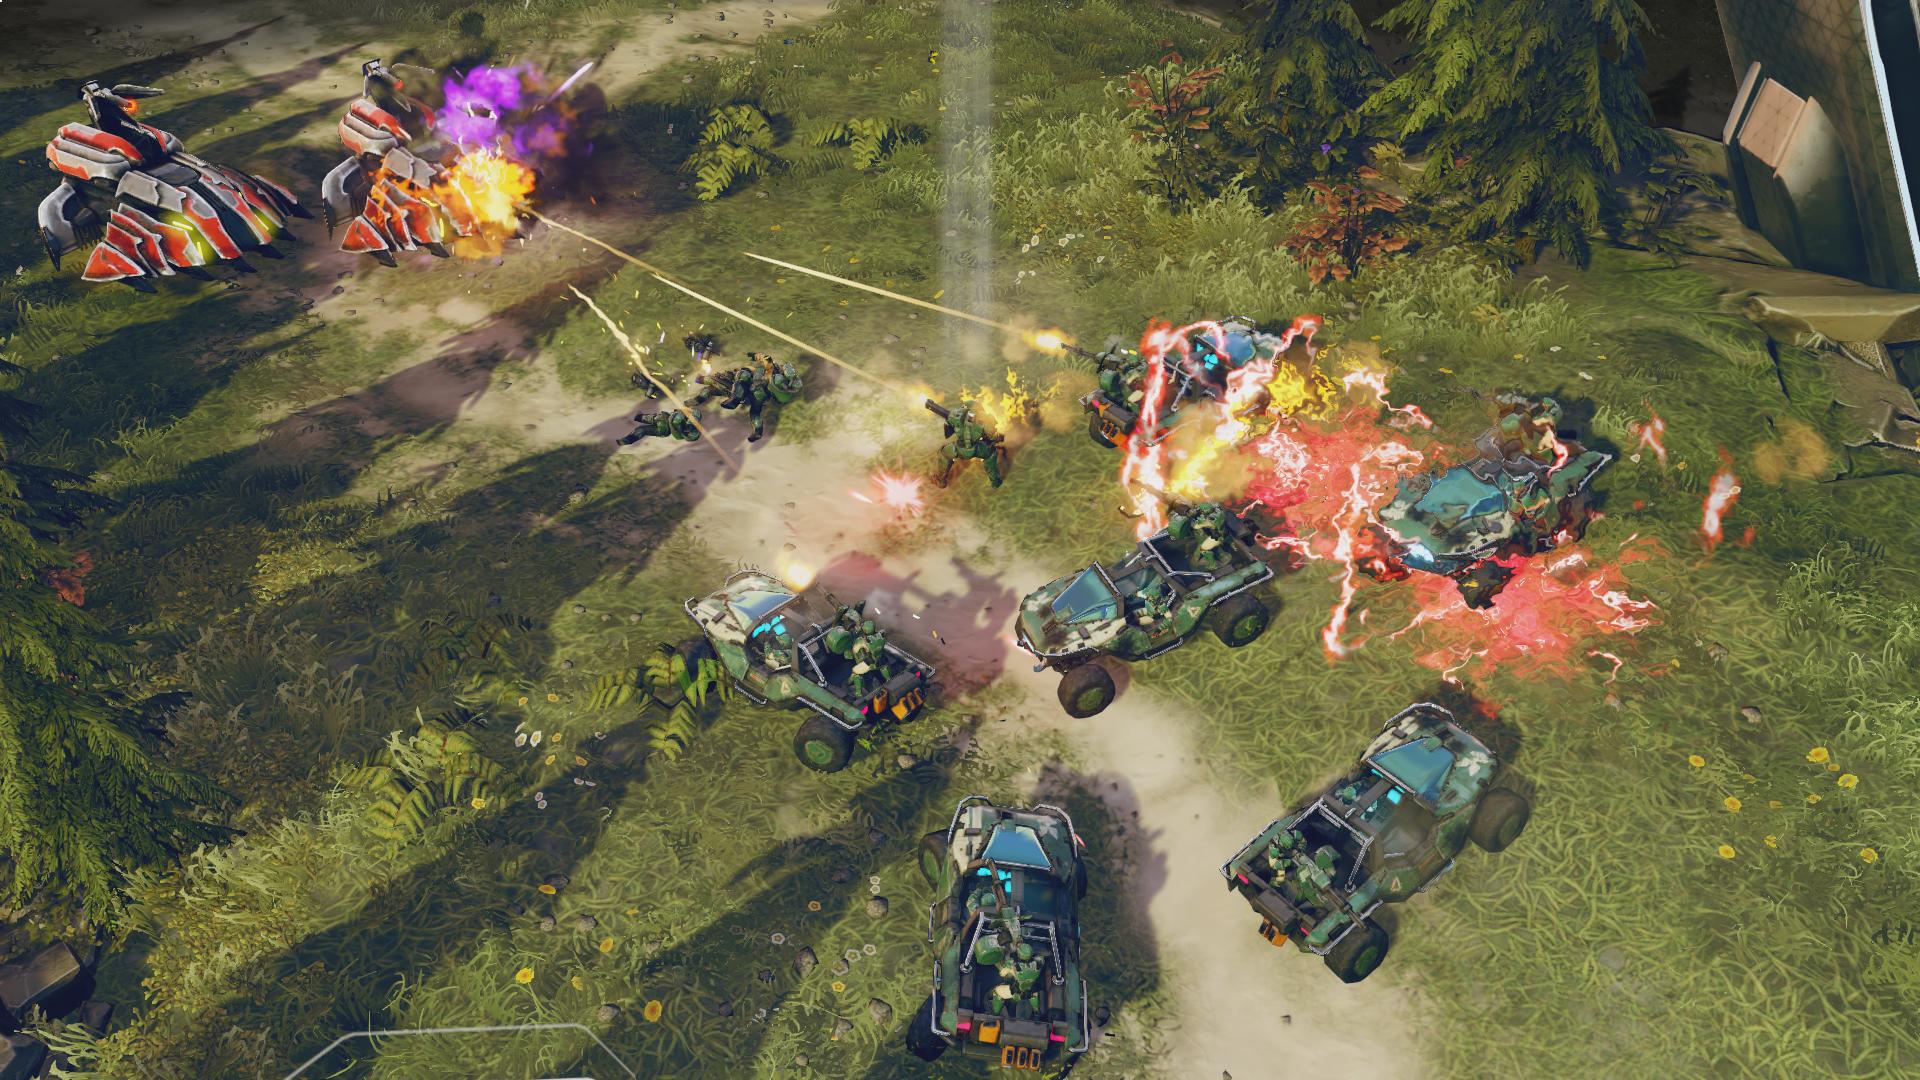 Multiplayer matchmaking játékok